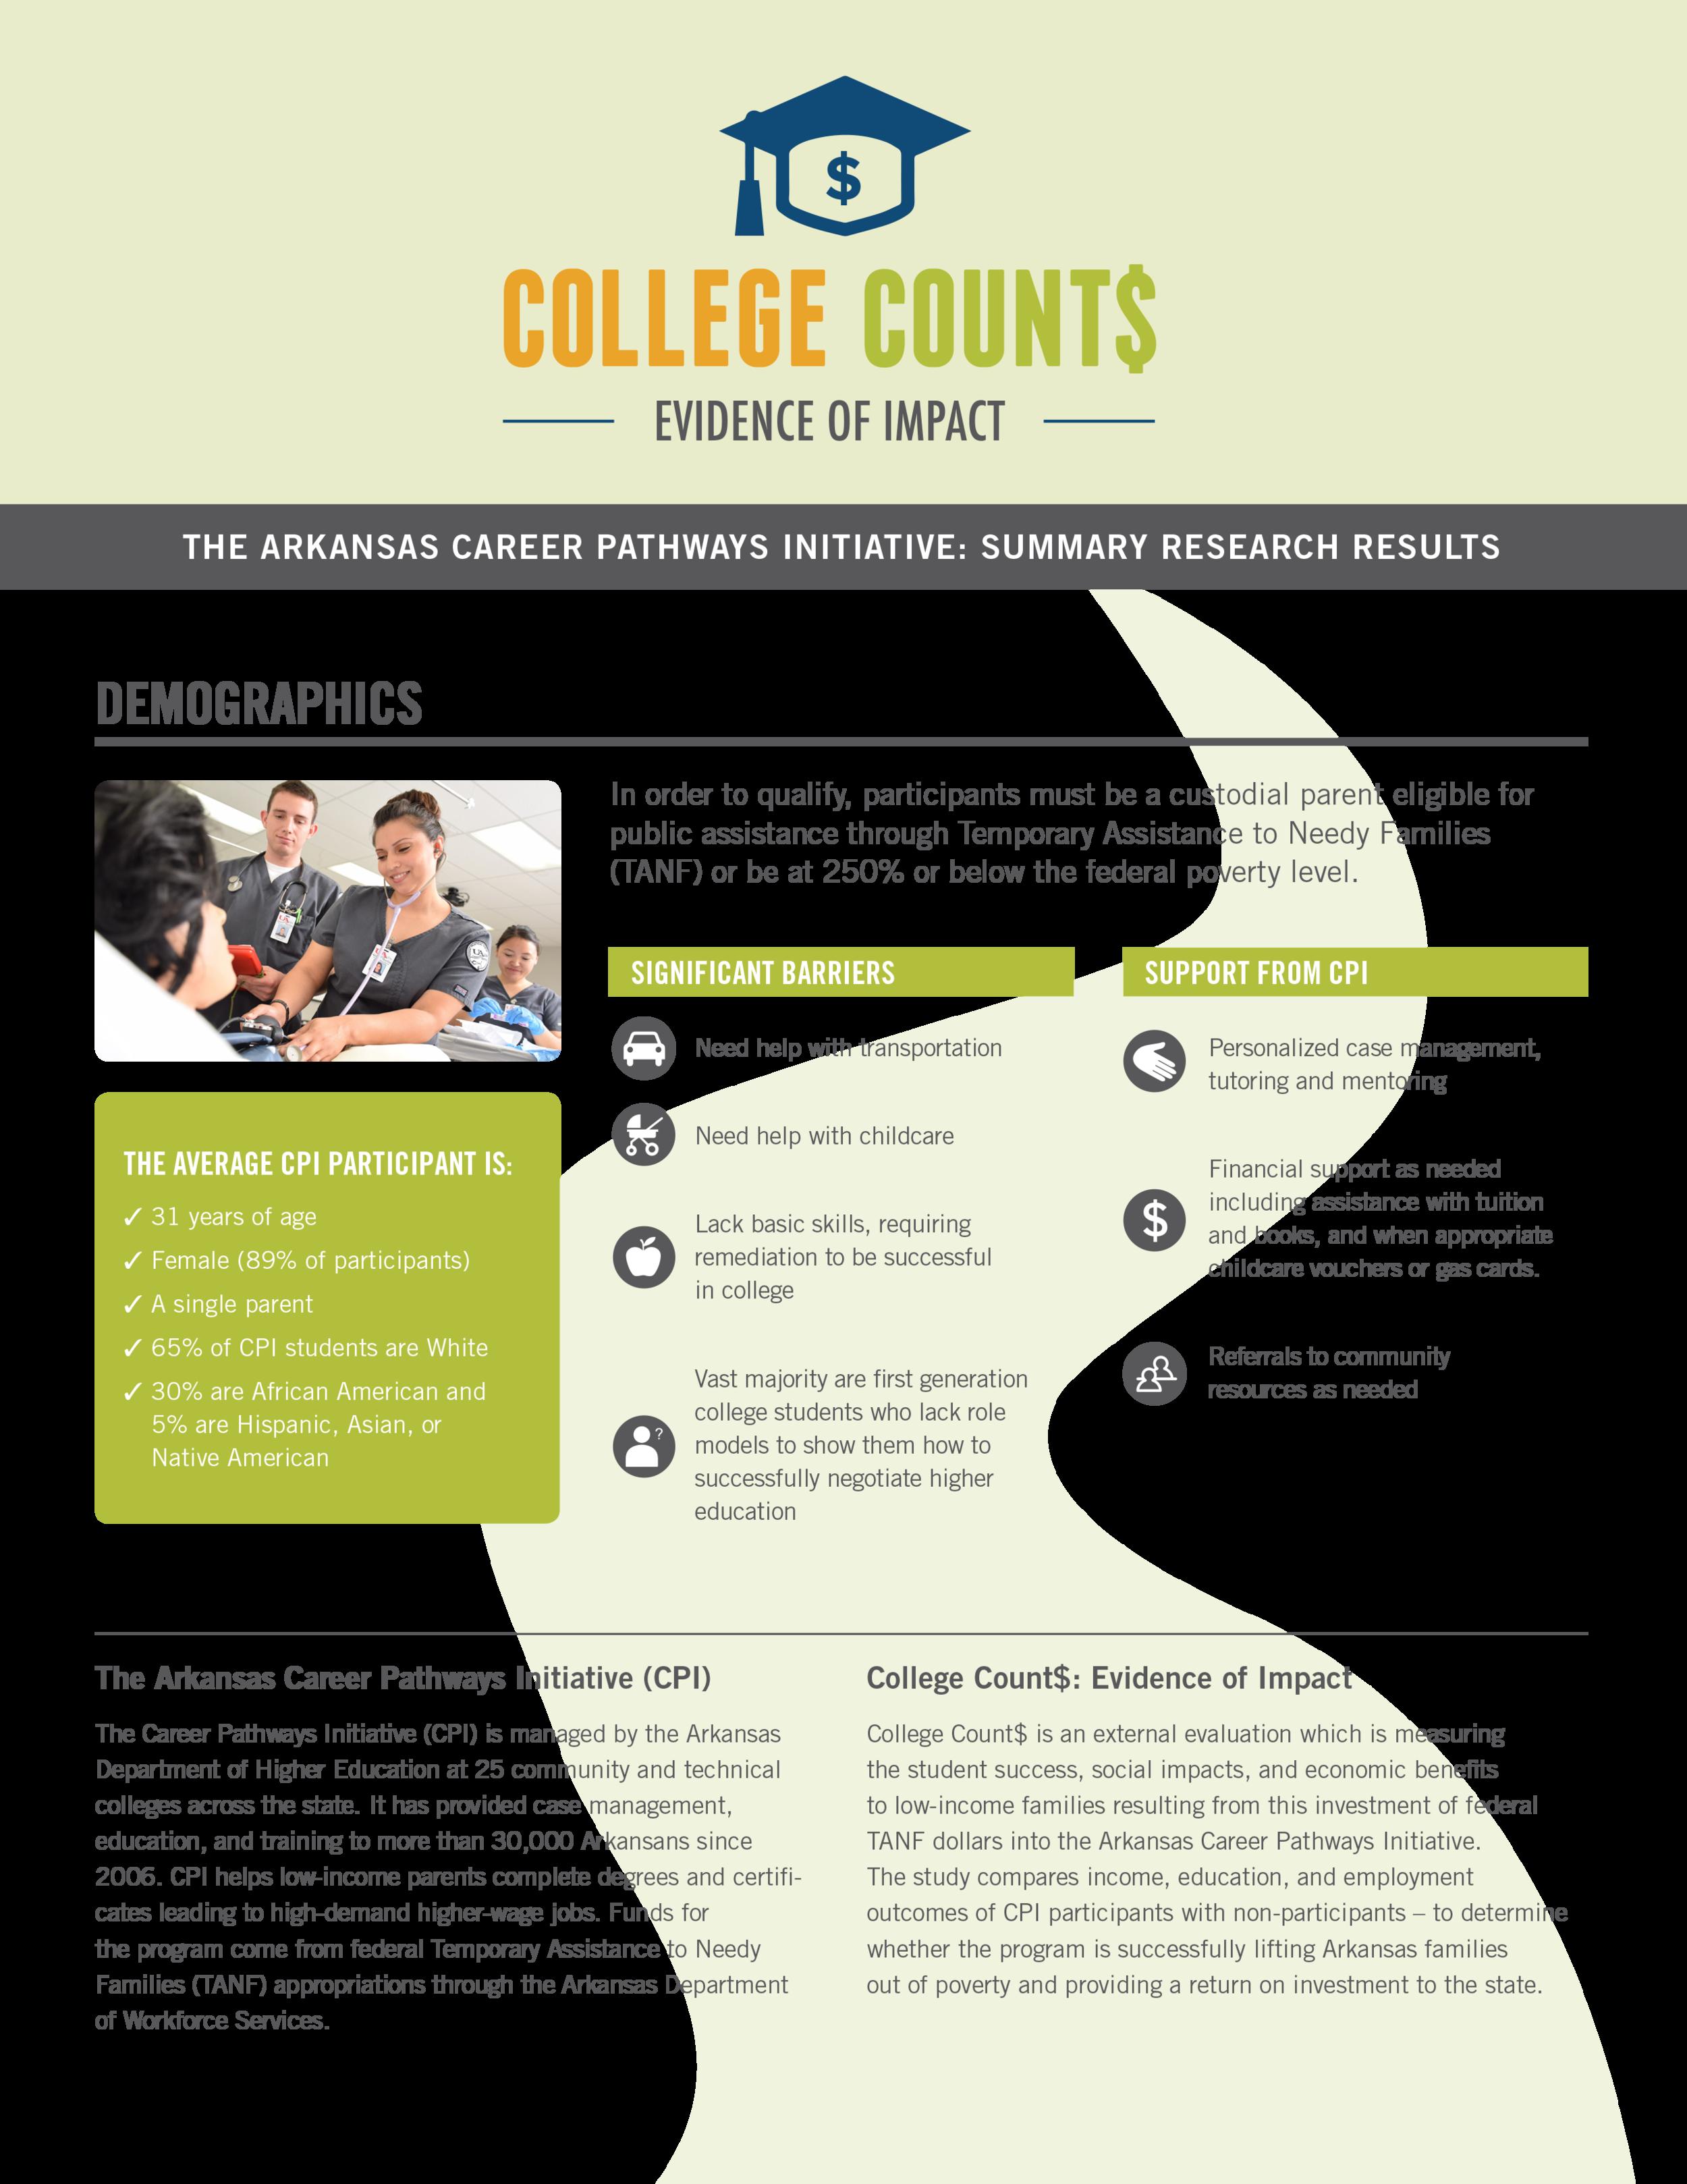 25023_dg_CollegeCounts_Infographic_ROI_11x17_m3_singles-1.png